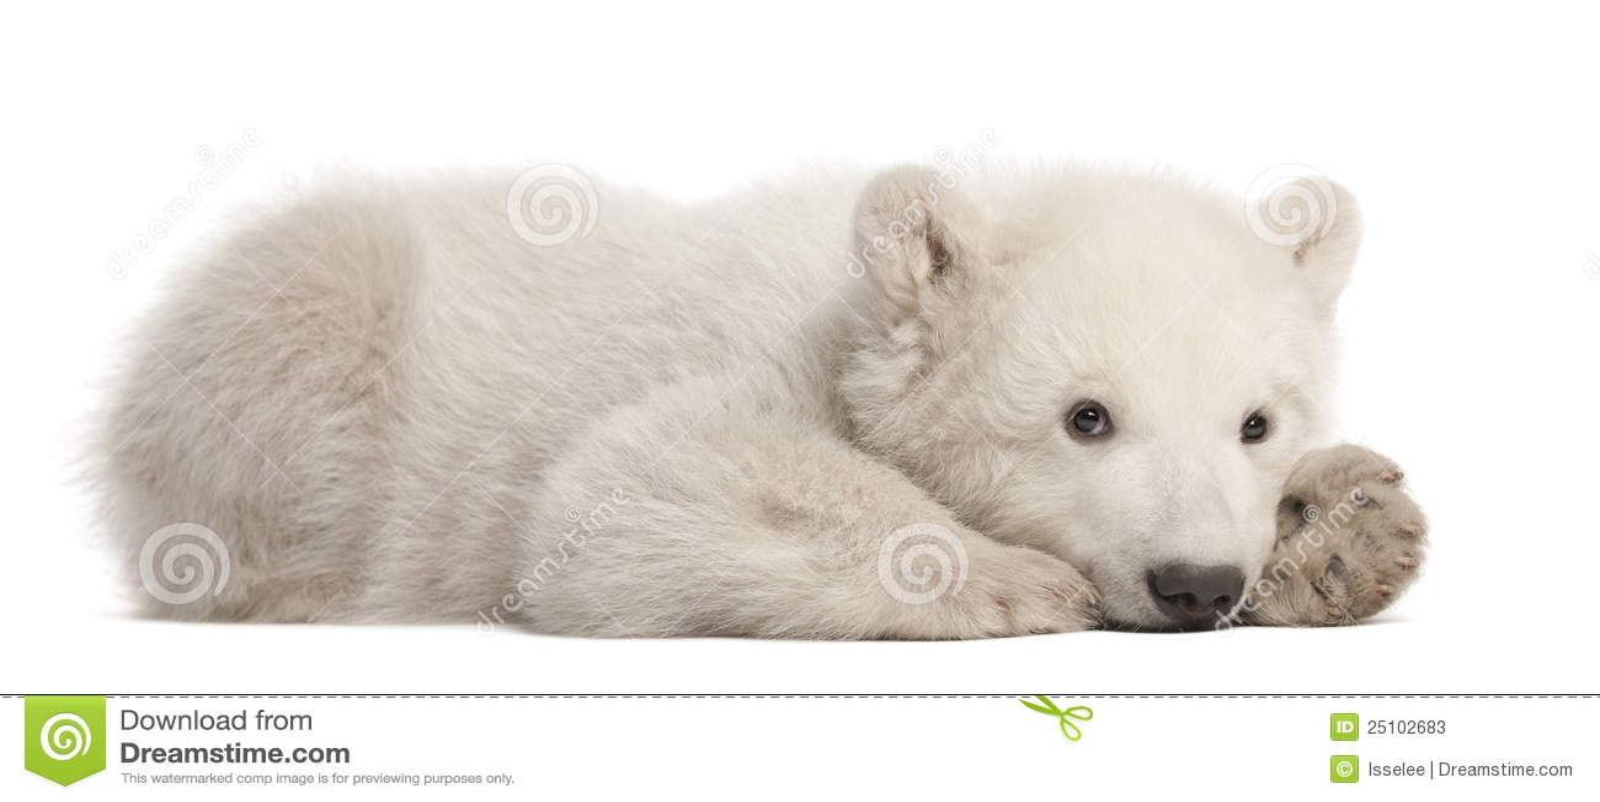 3个小熊maritimus月极性熊属类